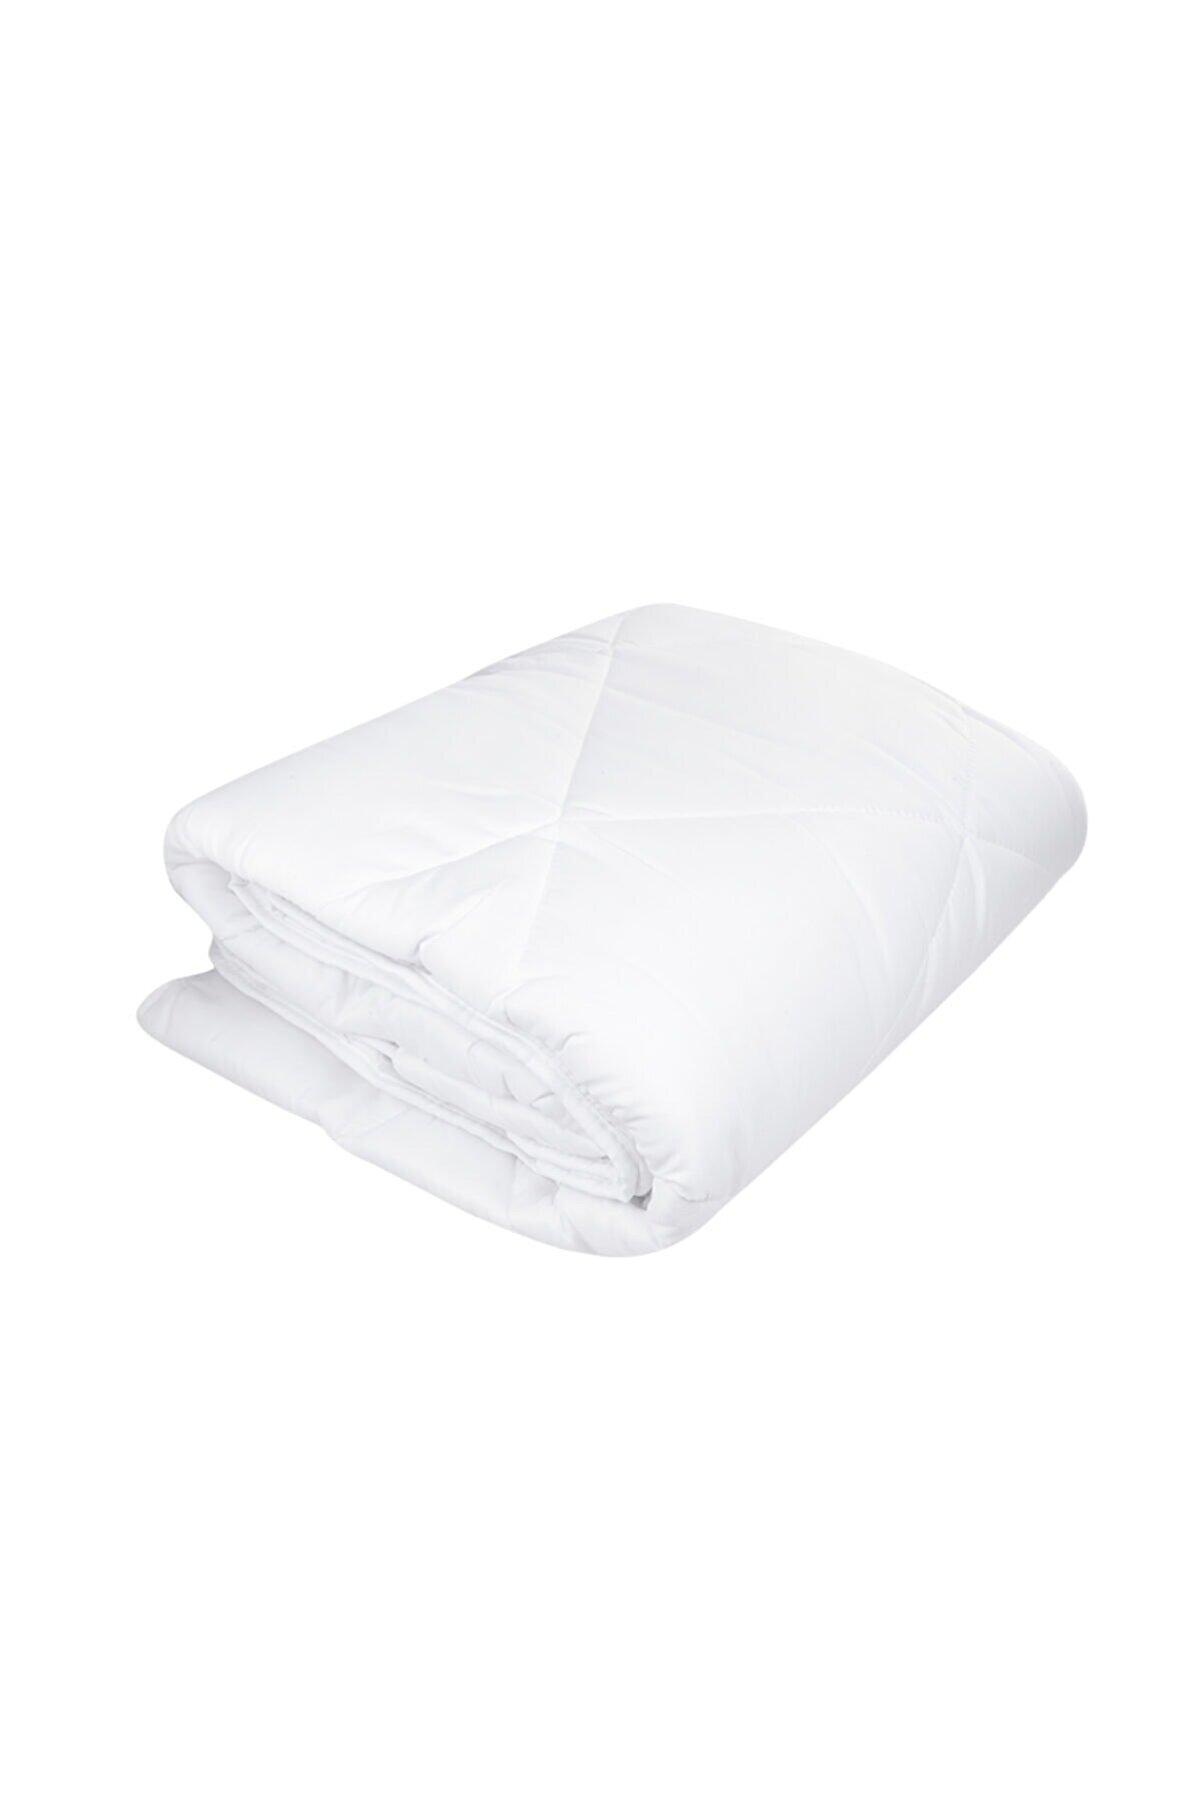 Karaca Home Beyaz Softy Micro Soft Çift Kişilik Uyku Pedi